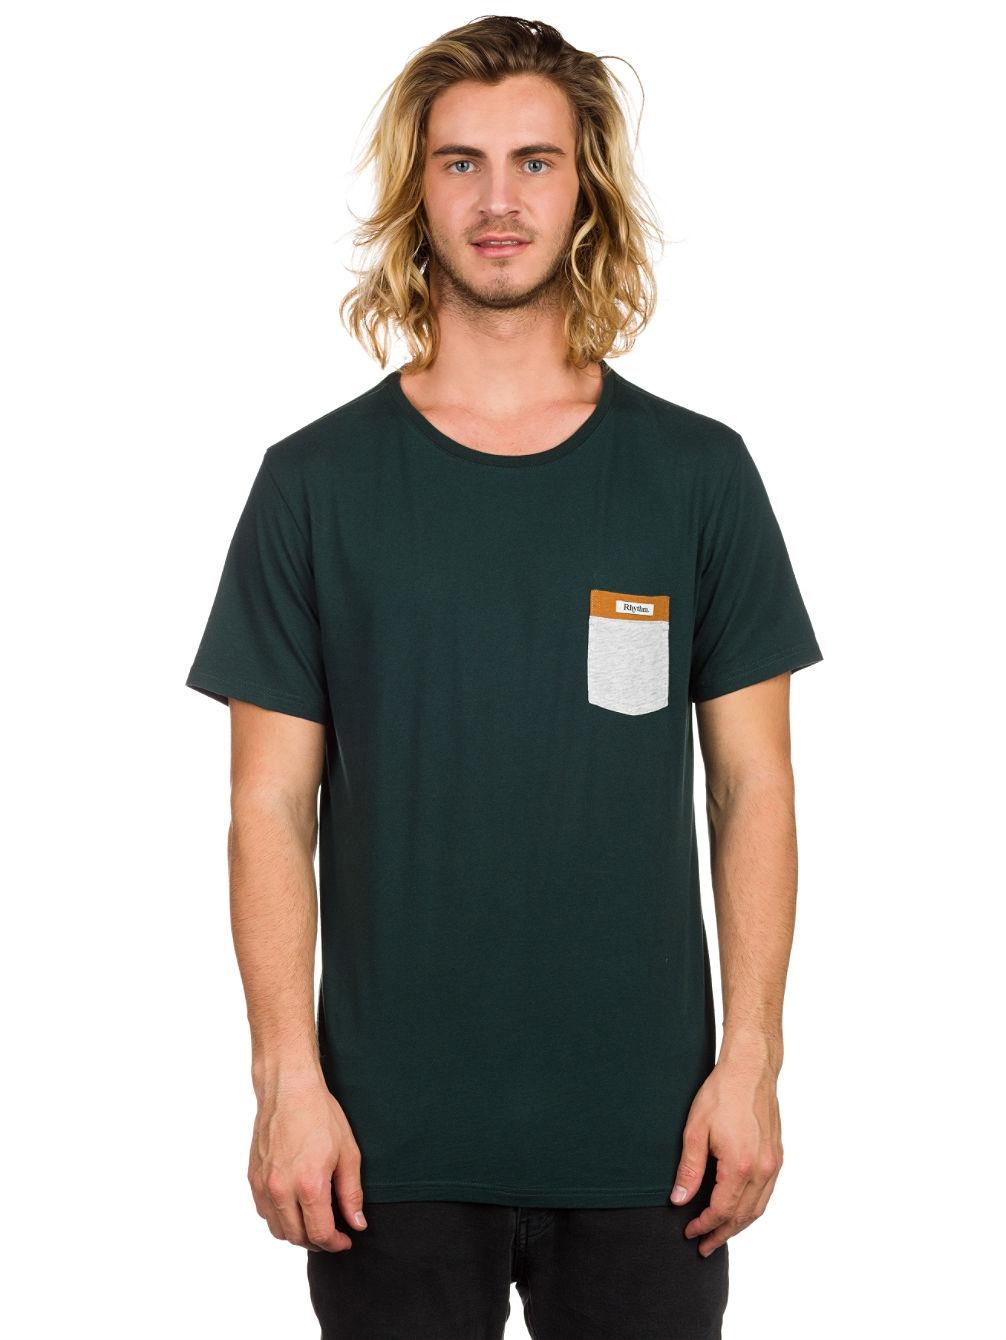 my-t-t-shirt